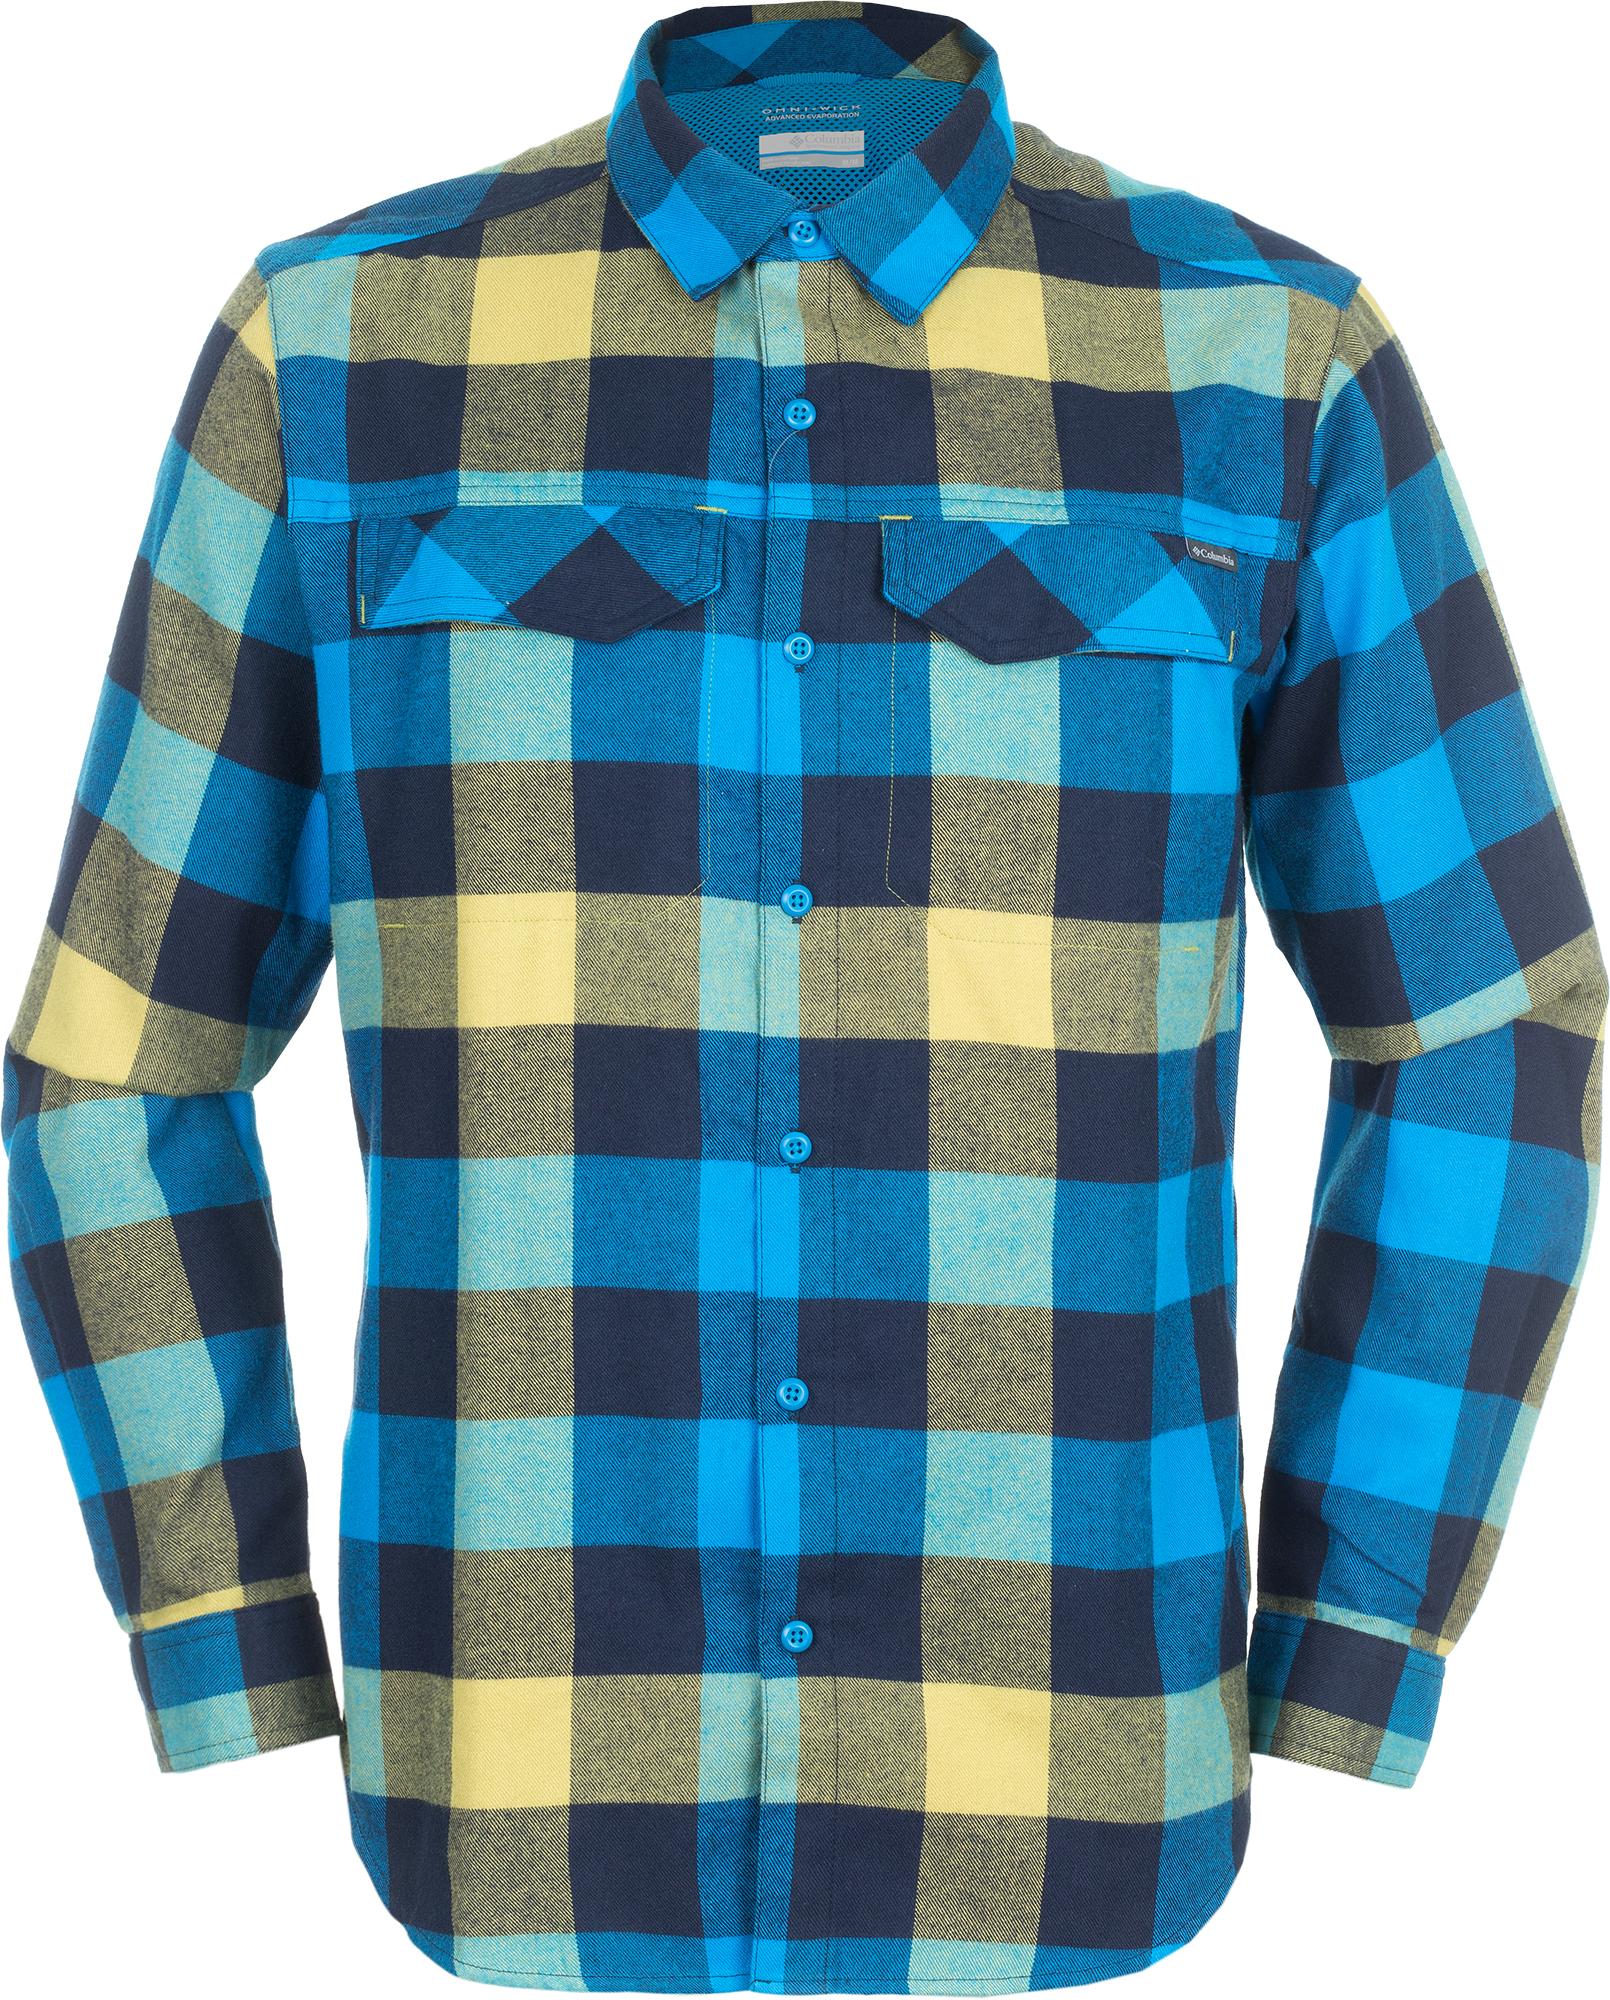 Columbia Рубашка с длинным рукавом мужская Columbia Silver Ridge columbia рубашка с длинным рукавом мужская columbia boulder ridge